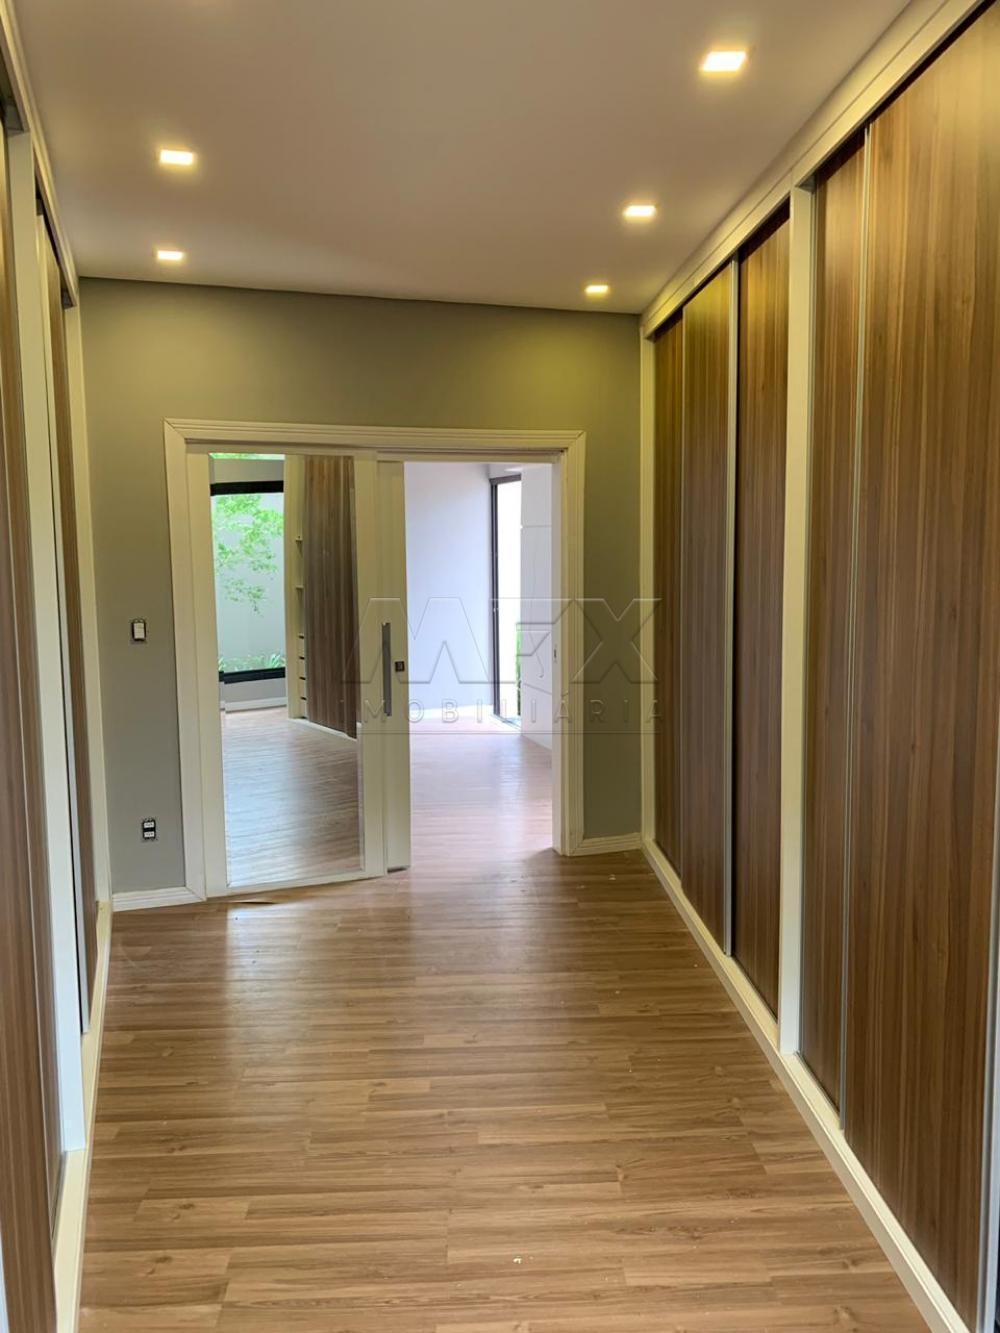 Comprar Casa / Condomínio em Bauru apenas R$ 1.680.000,00 - Foto 12